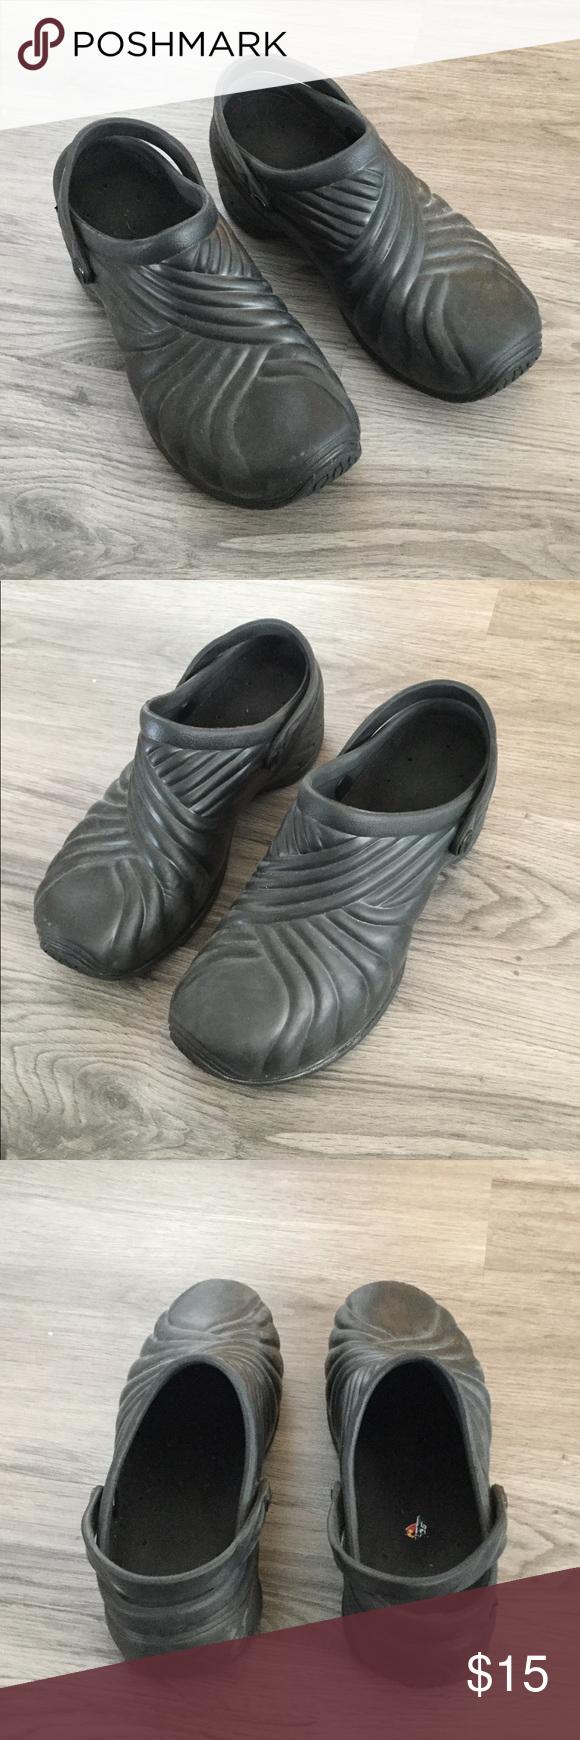 resistant medical shoes shipping pin nursing women colors comfortable lightweight slip free s ebay comforter